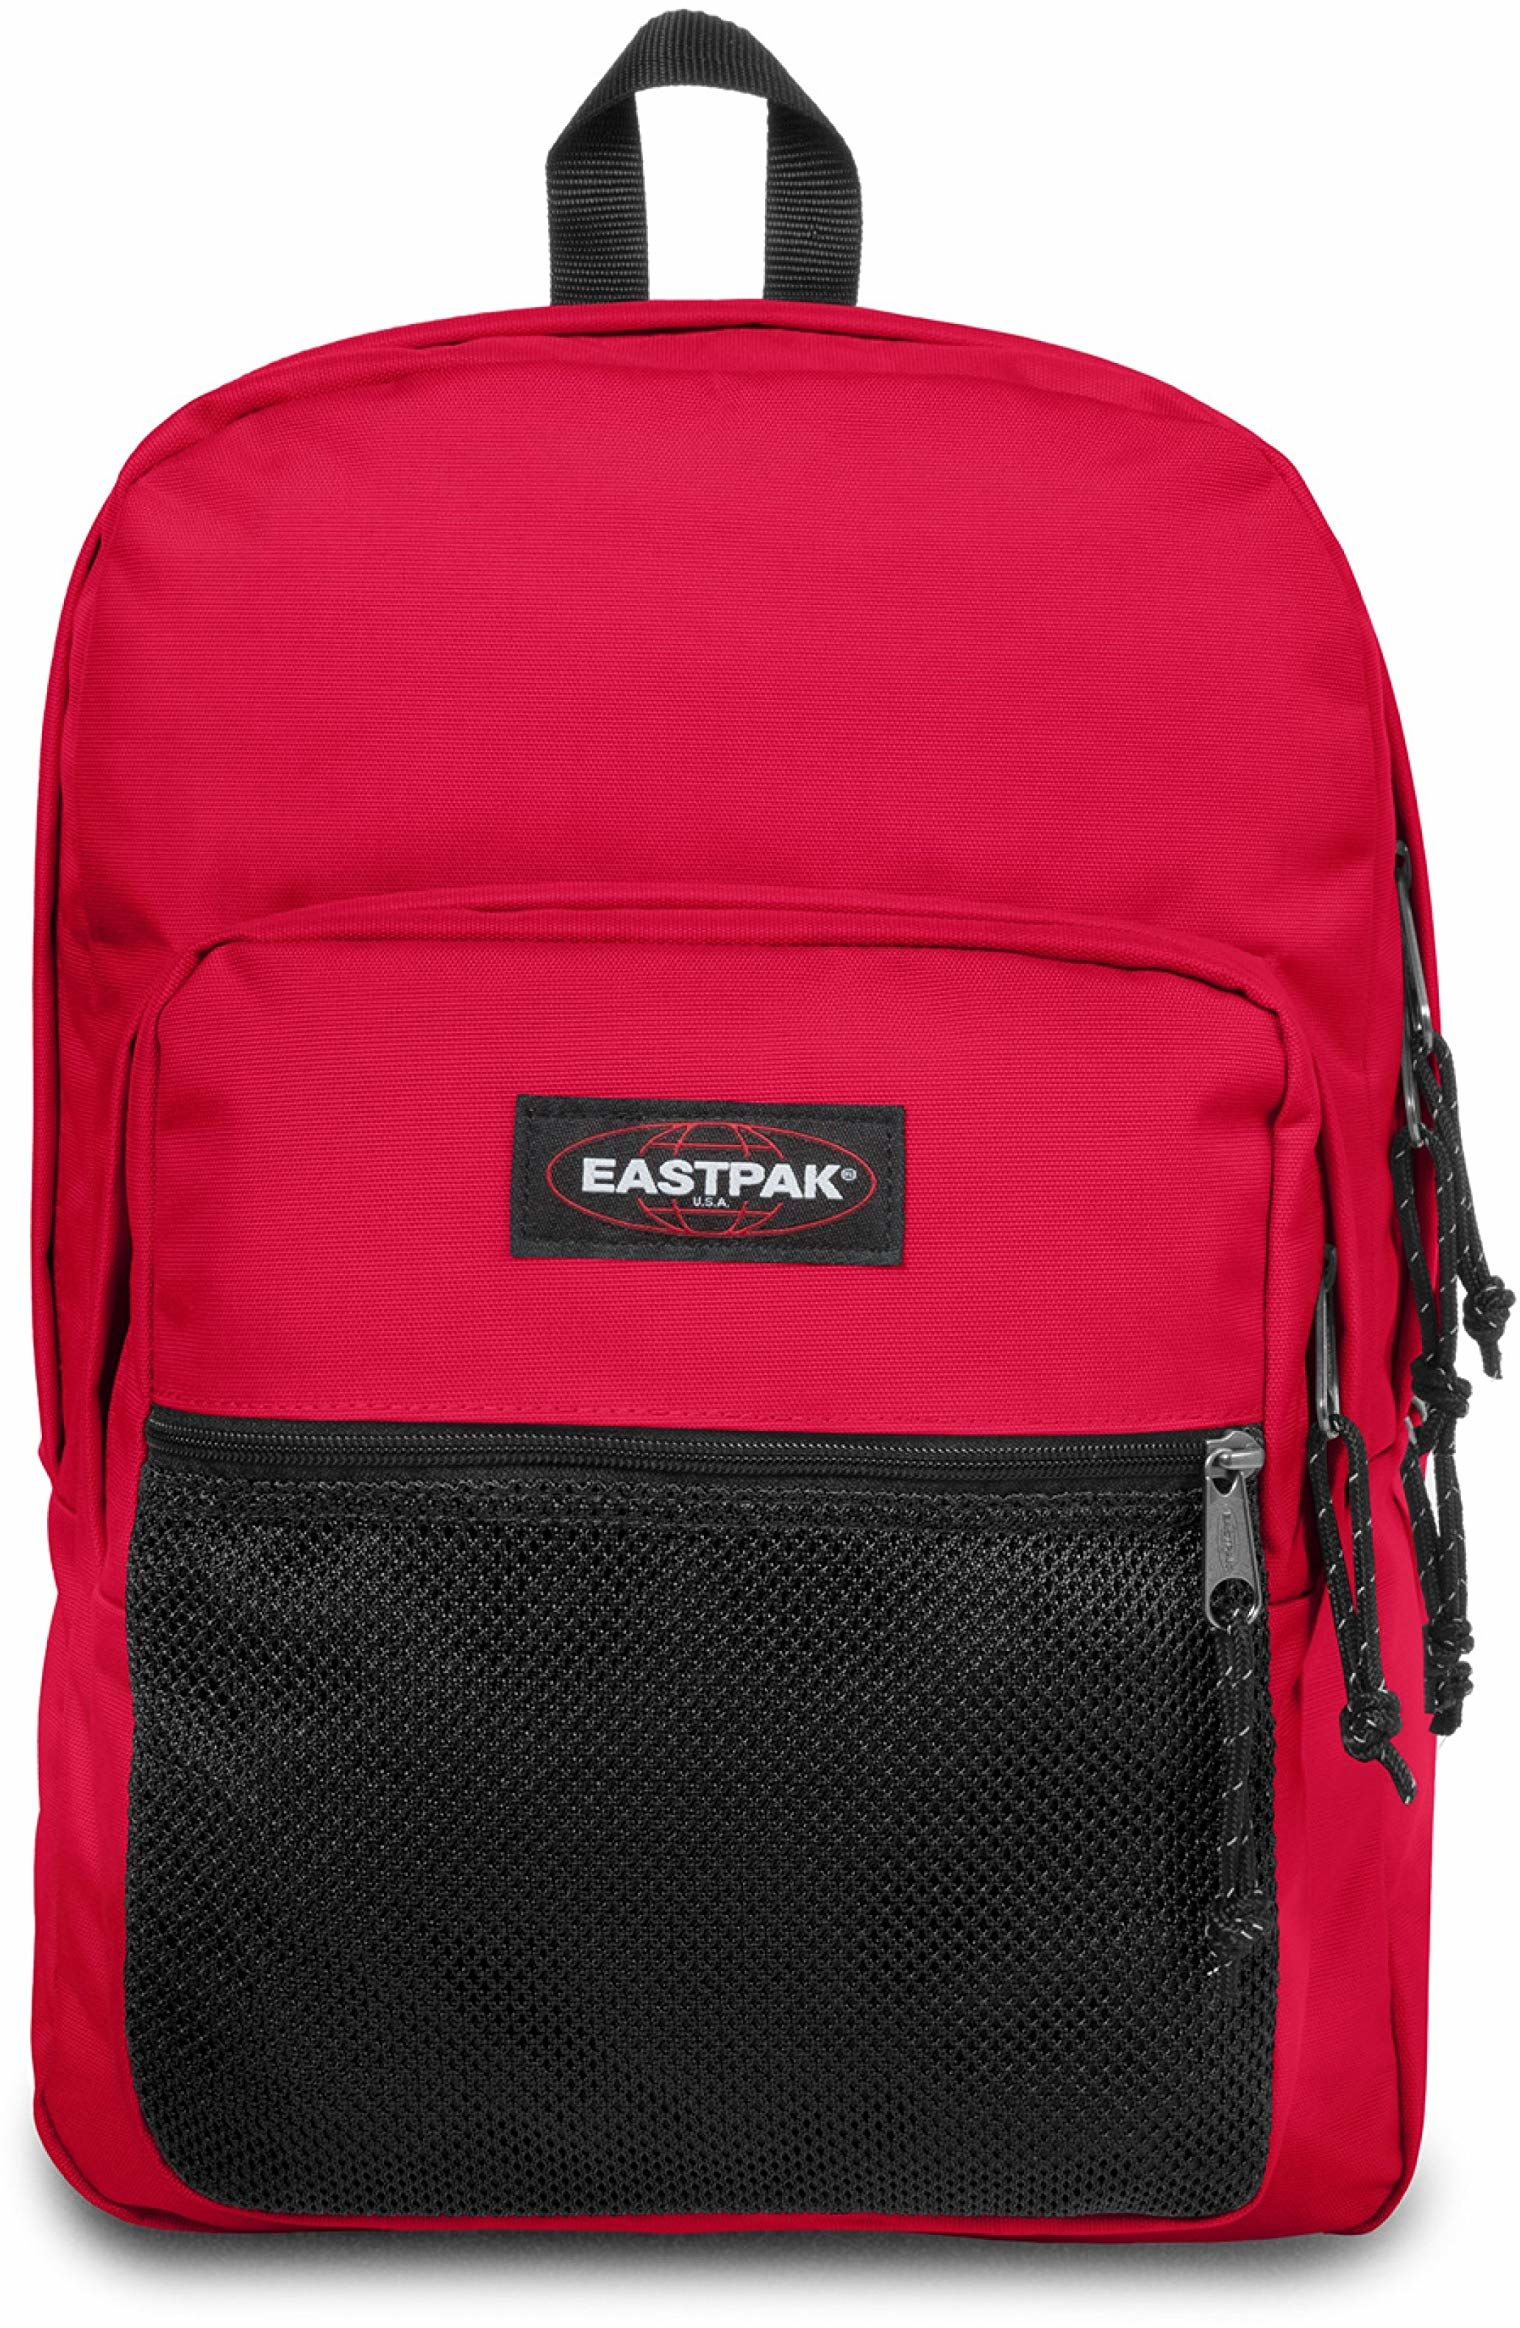 Eastpak Plecak Pinnacle, 42 x 32 x 25,5, Sailor Red (czerwony) - EK00006084Z